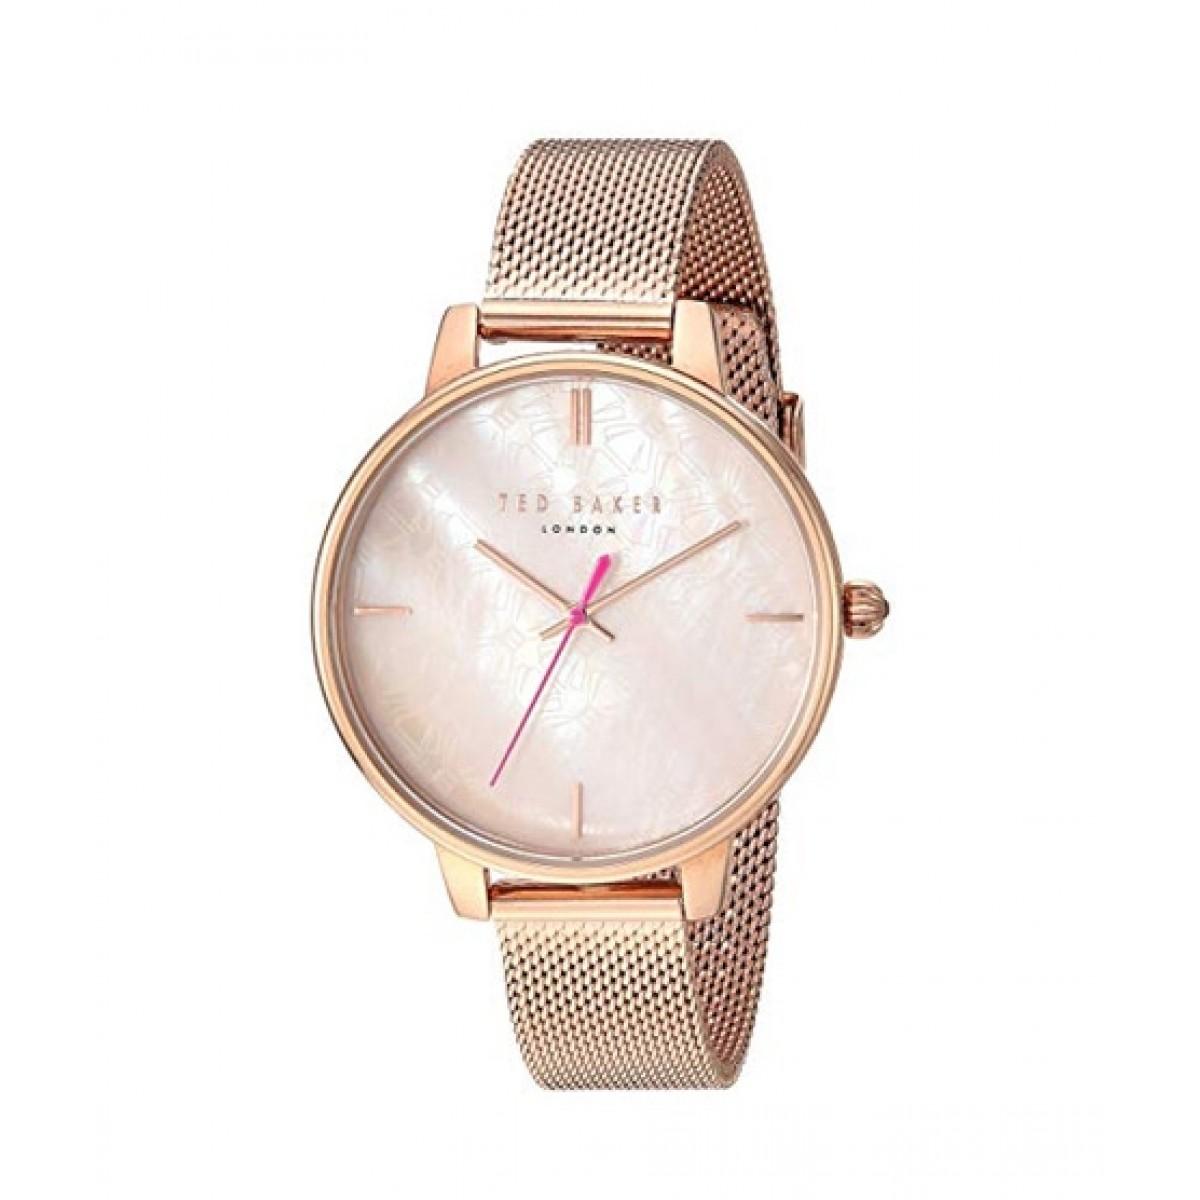 1556bef3ce6 Ted Baker Kate Quartz Women s Watch Price in Pakistan